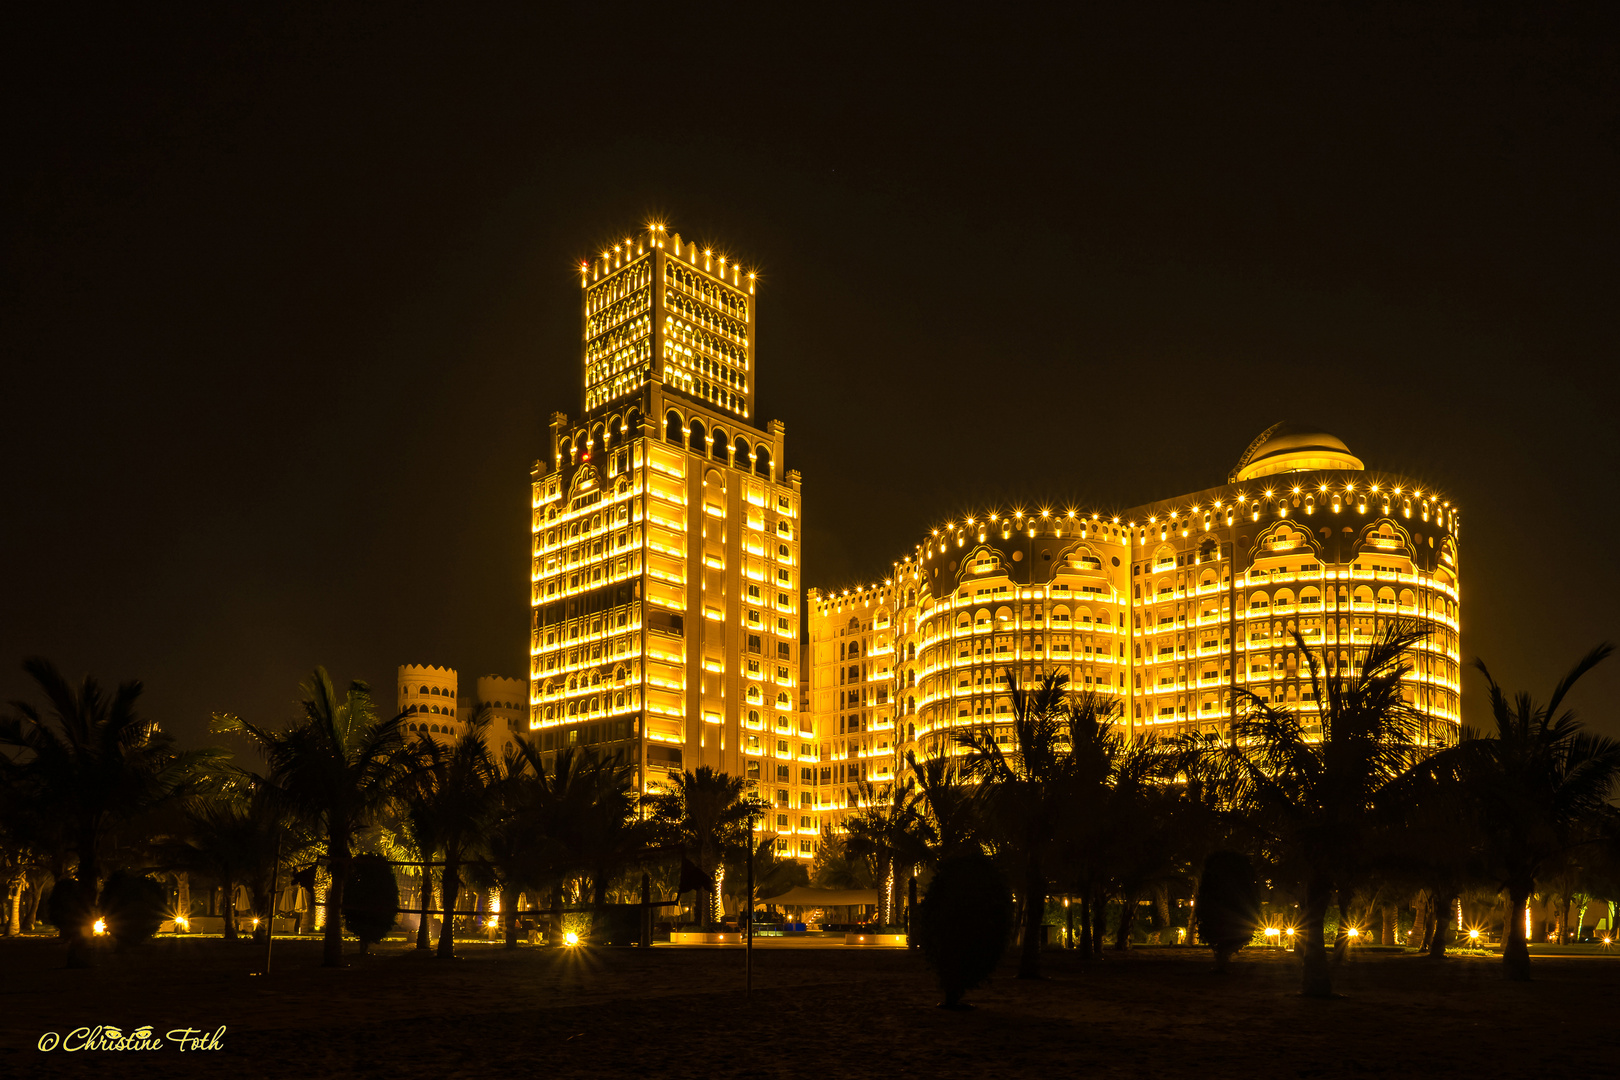 Ras Al Khaimar - Hotel Waldorf Astoria am Abend